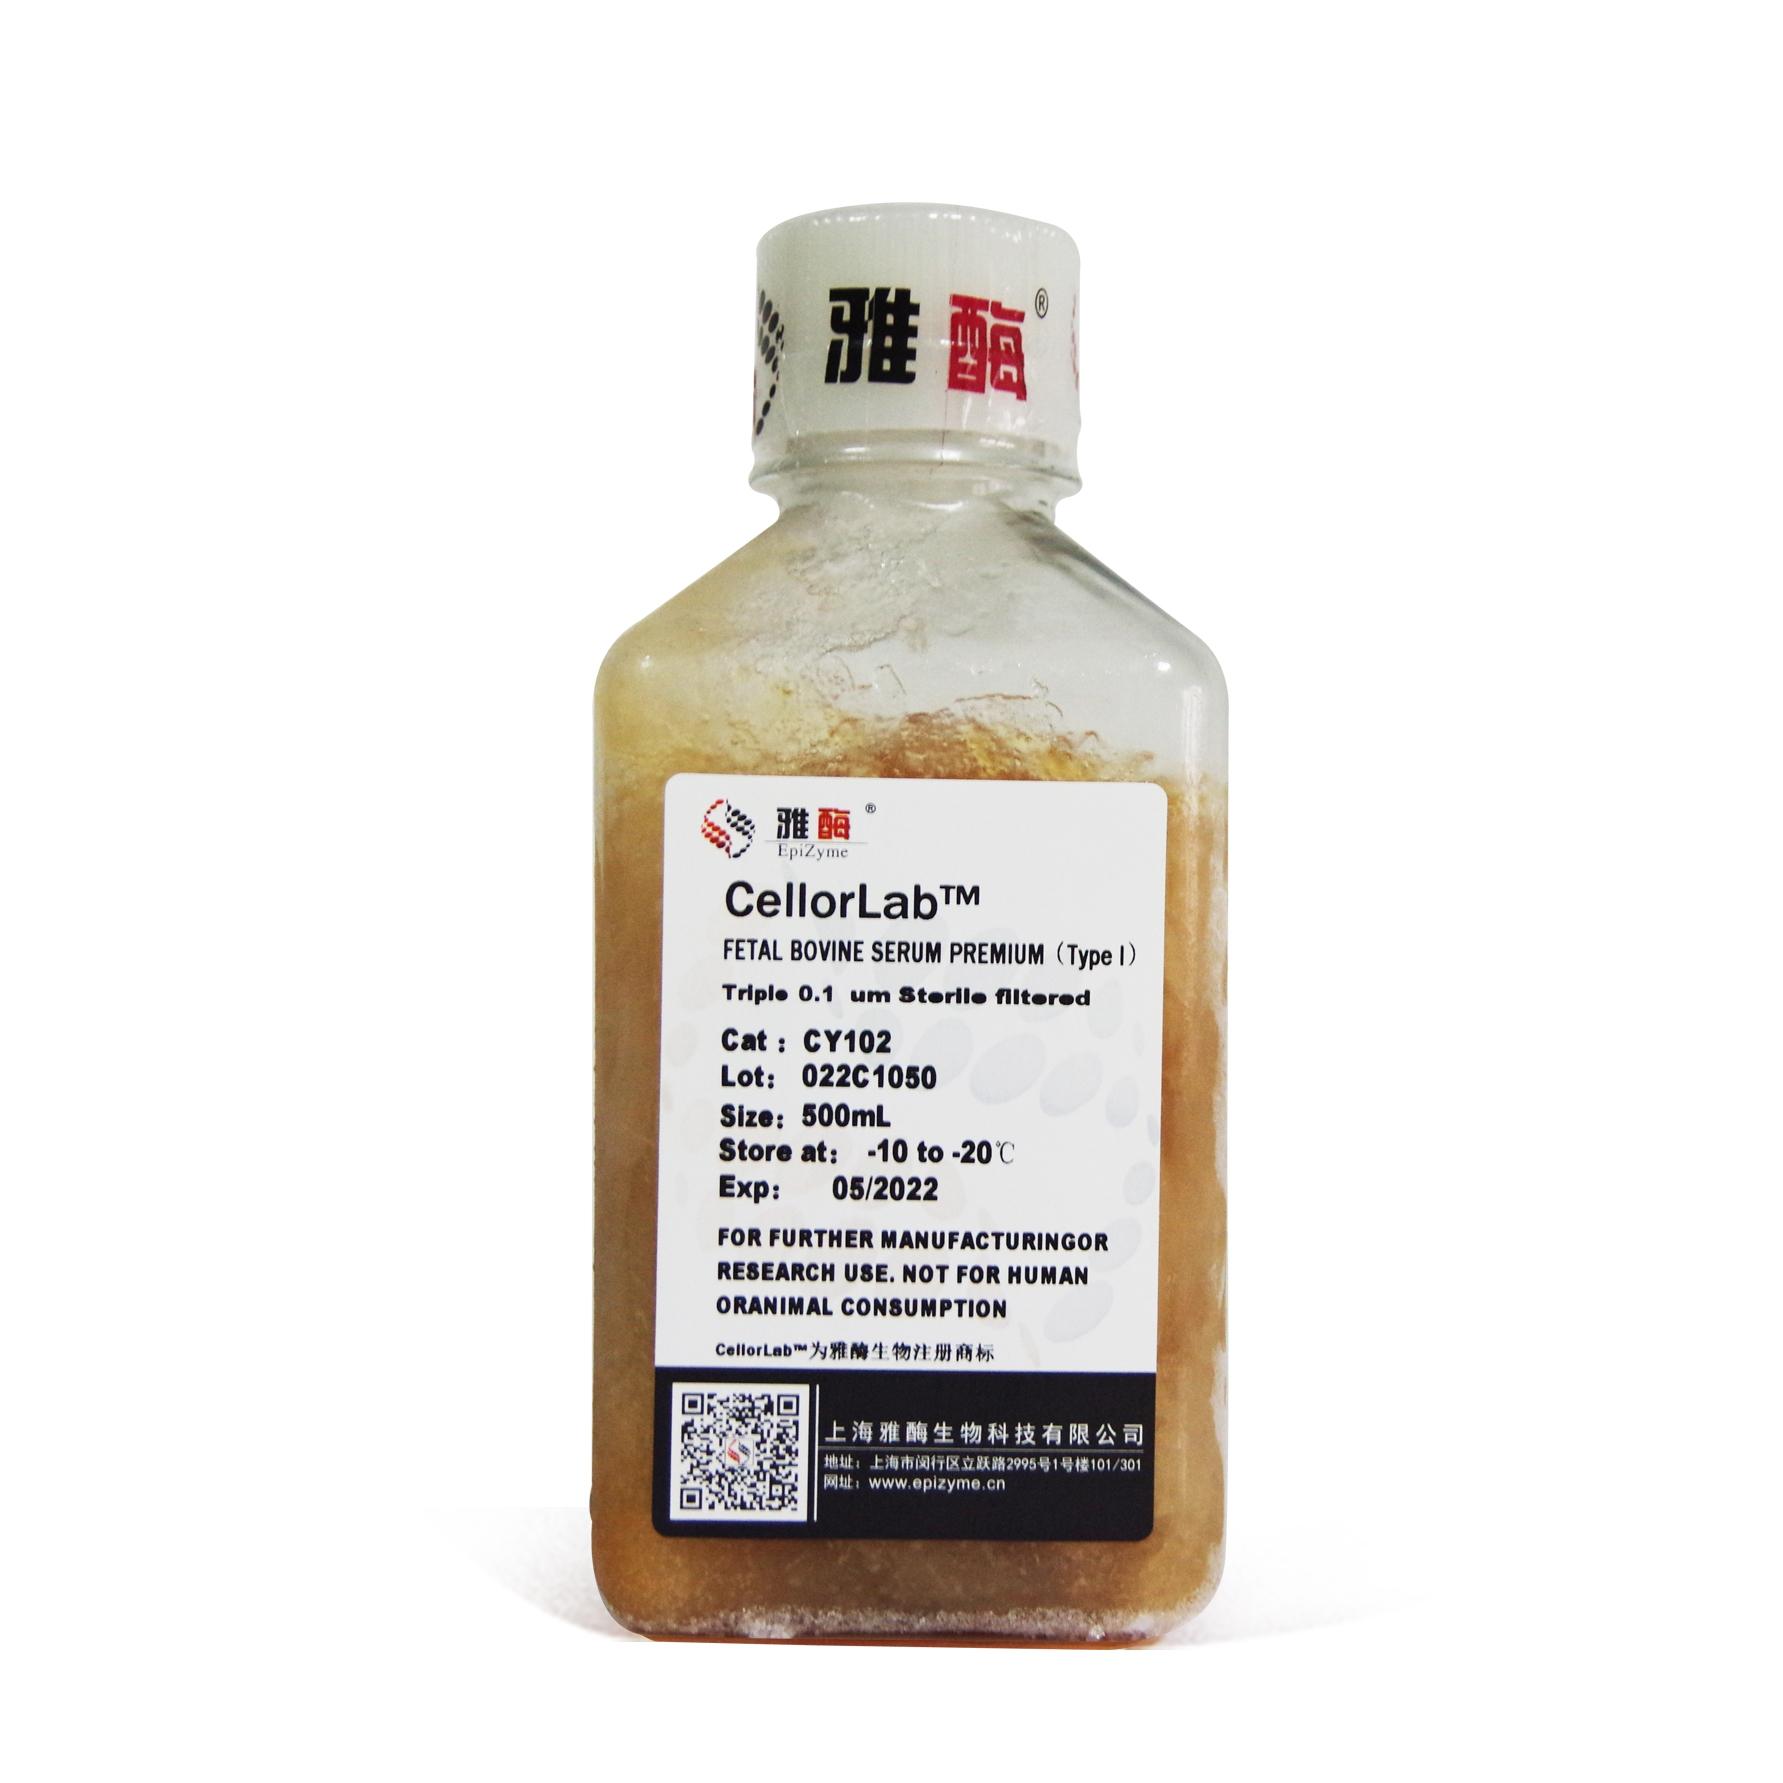 特级胎牛血清(I型) Fetal Bovine Serum Premium(Type I)